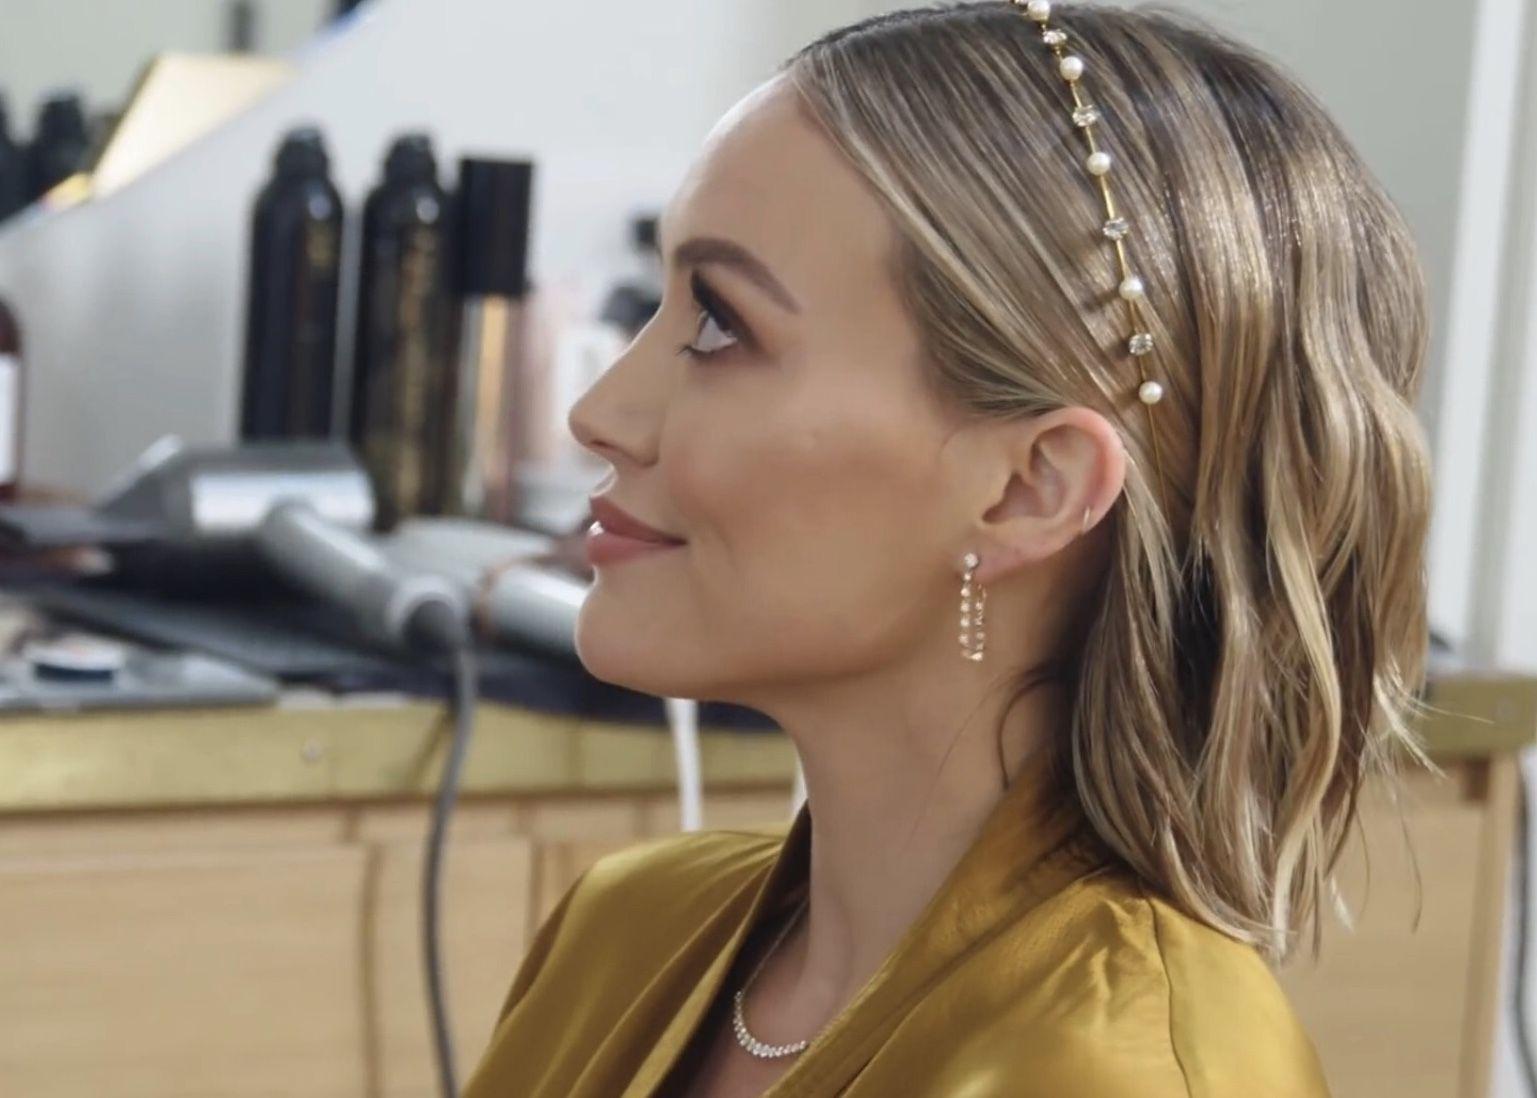 Pin By Elo On Hilary Duff Hillary Duff Hair Wedding Hair Inspiration Wedding Hair And Makeup